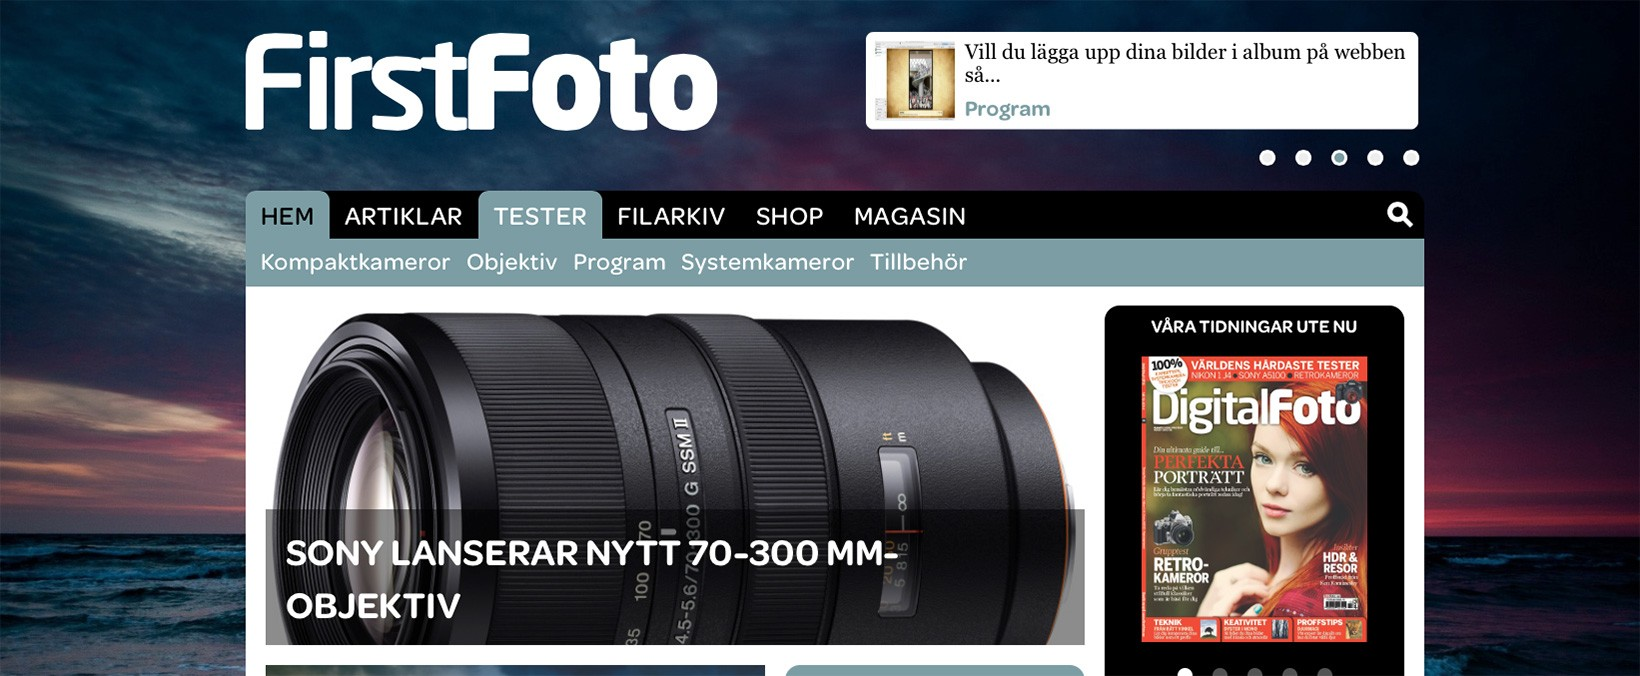 firstfoto.se